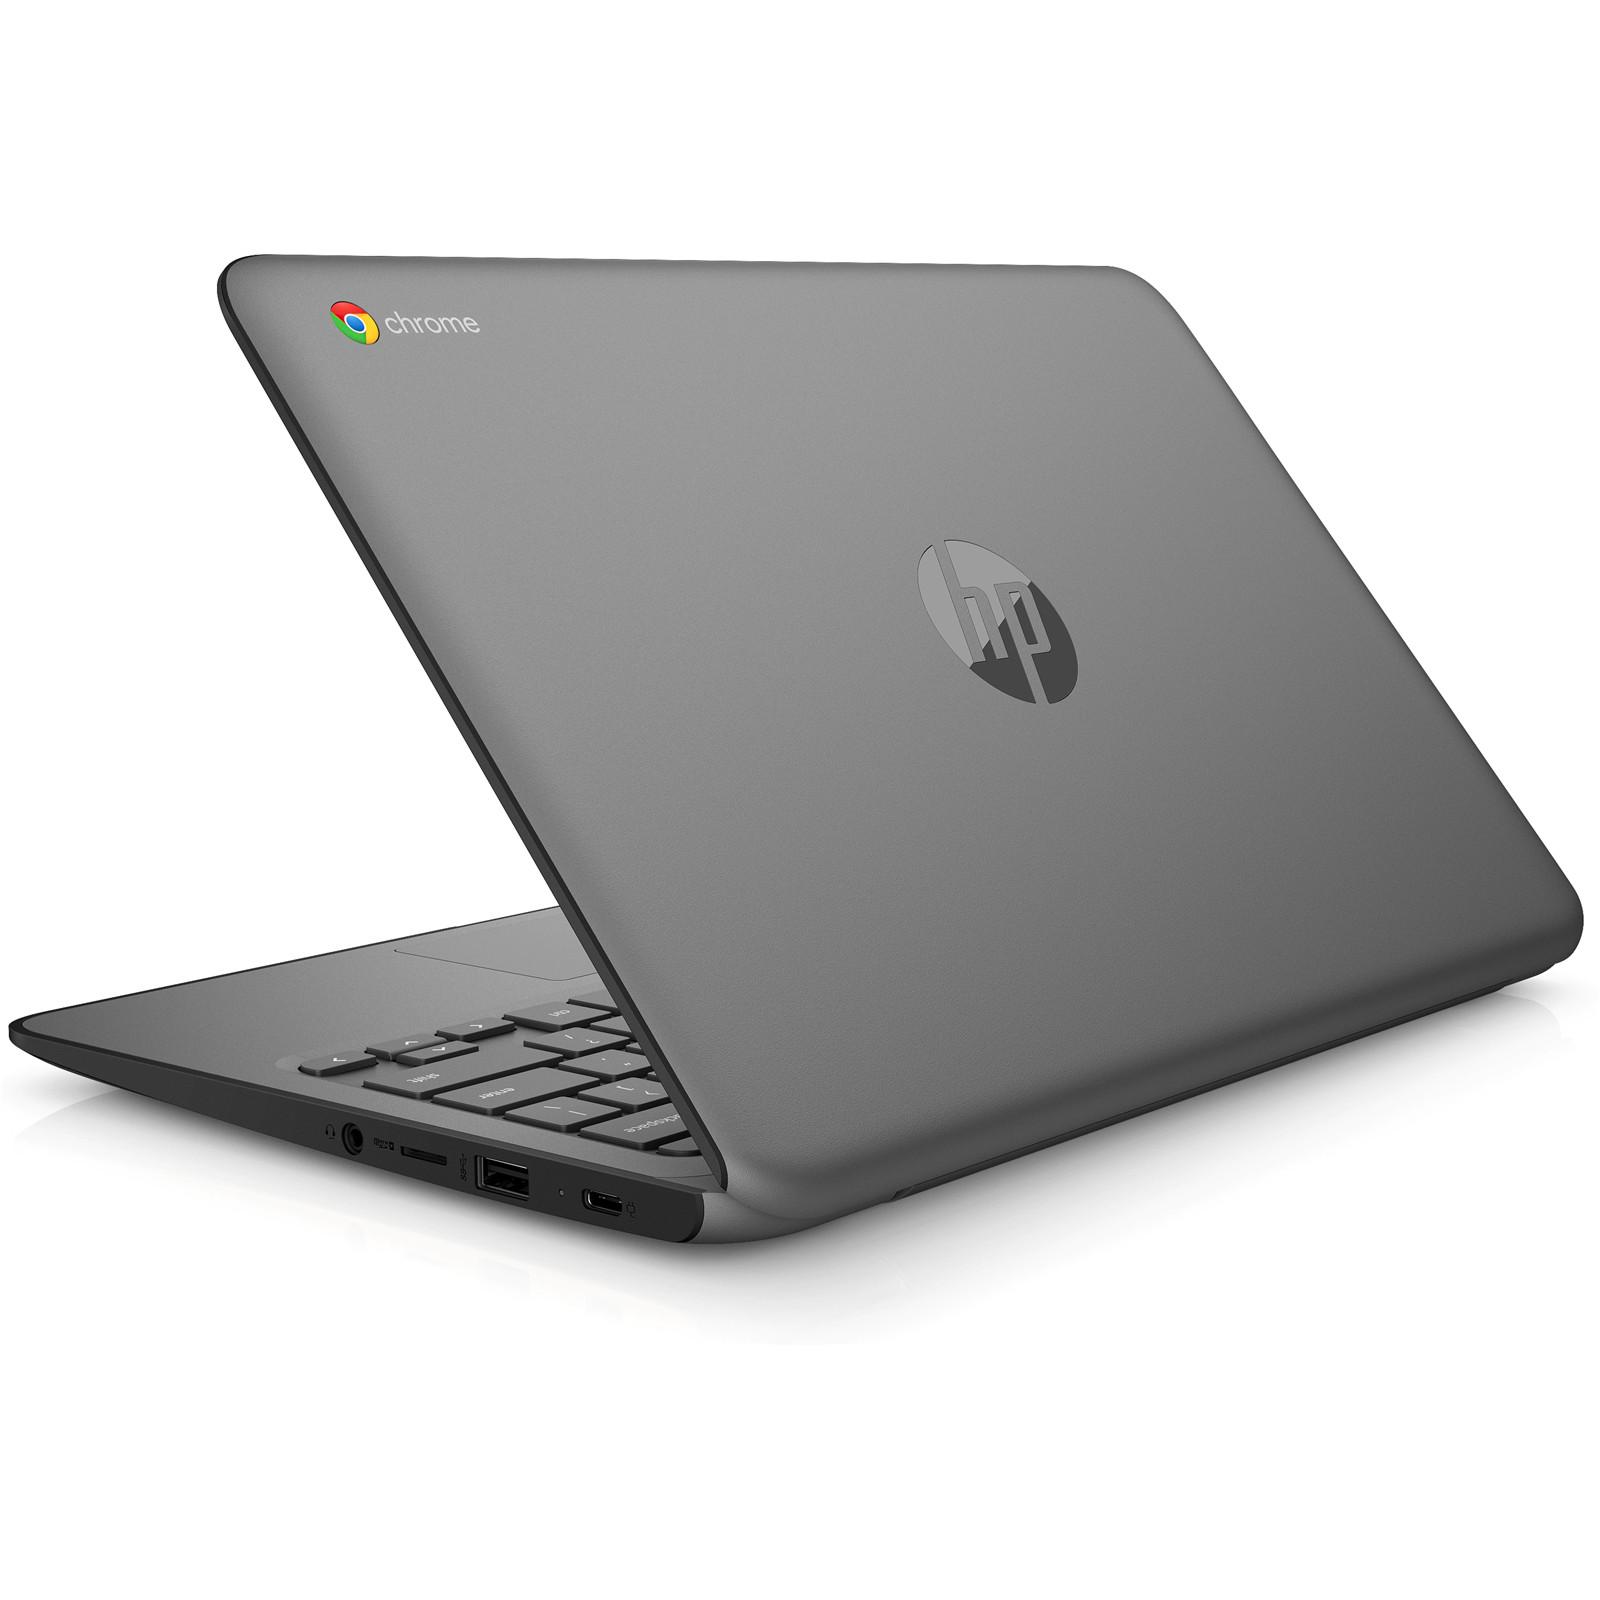 Buy the HP ChromeBook 11 G6 Semi Rugged Design Education